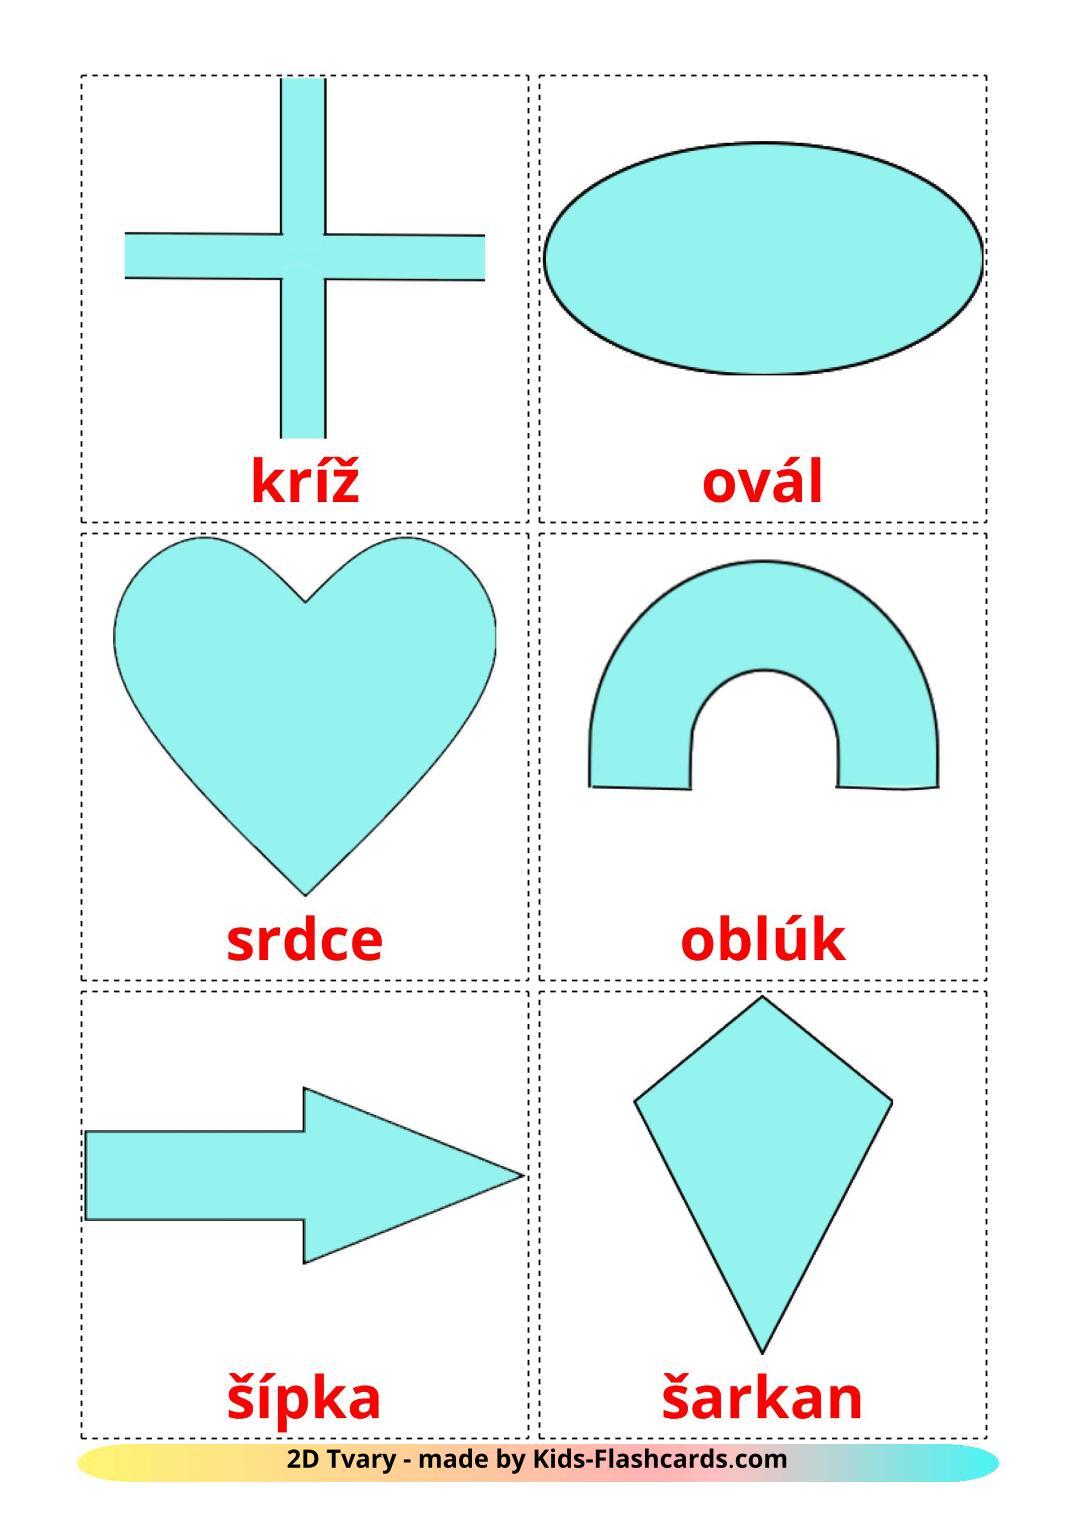 2D Shapes - 35 Free Printable slovak Flashcards